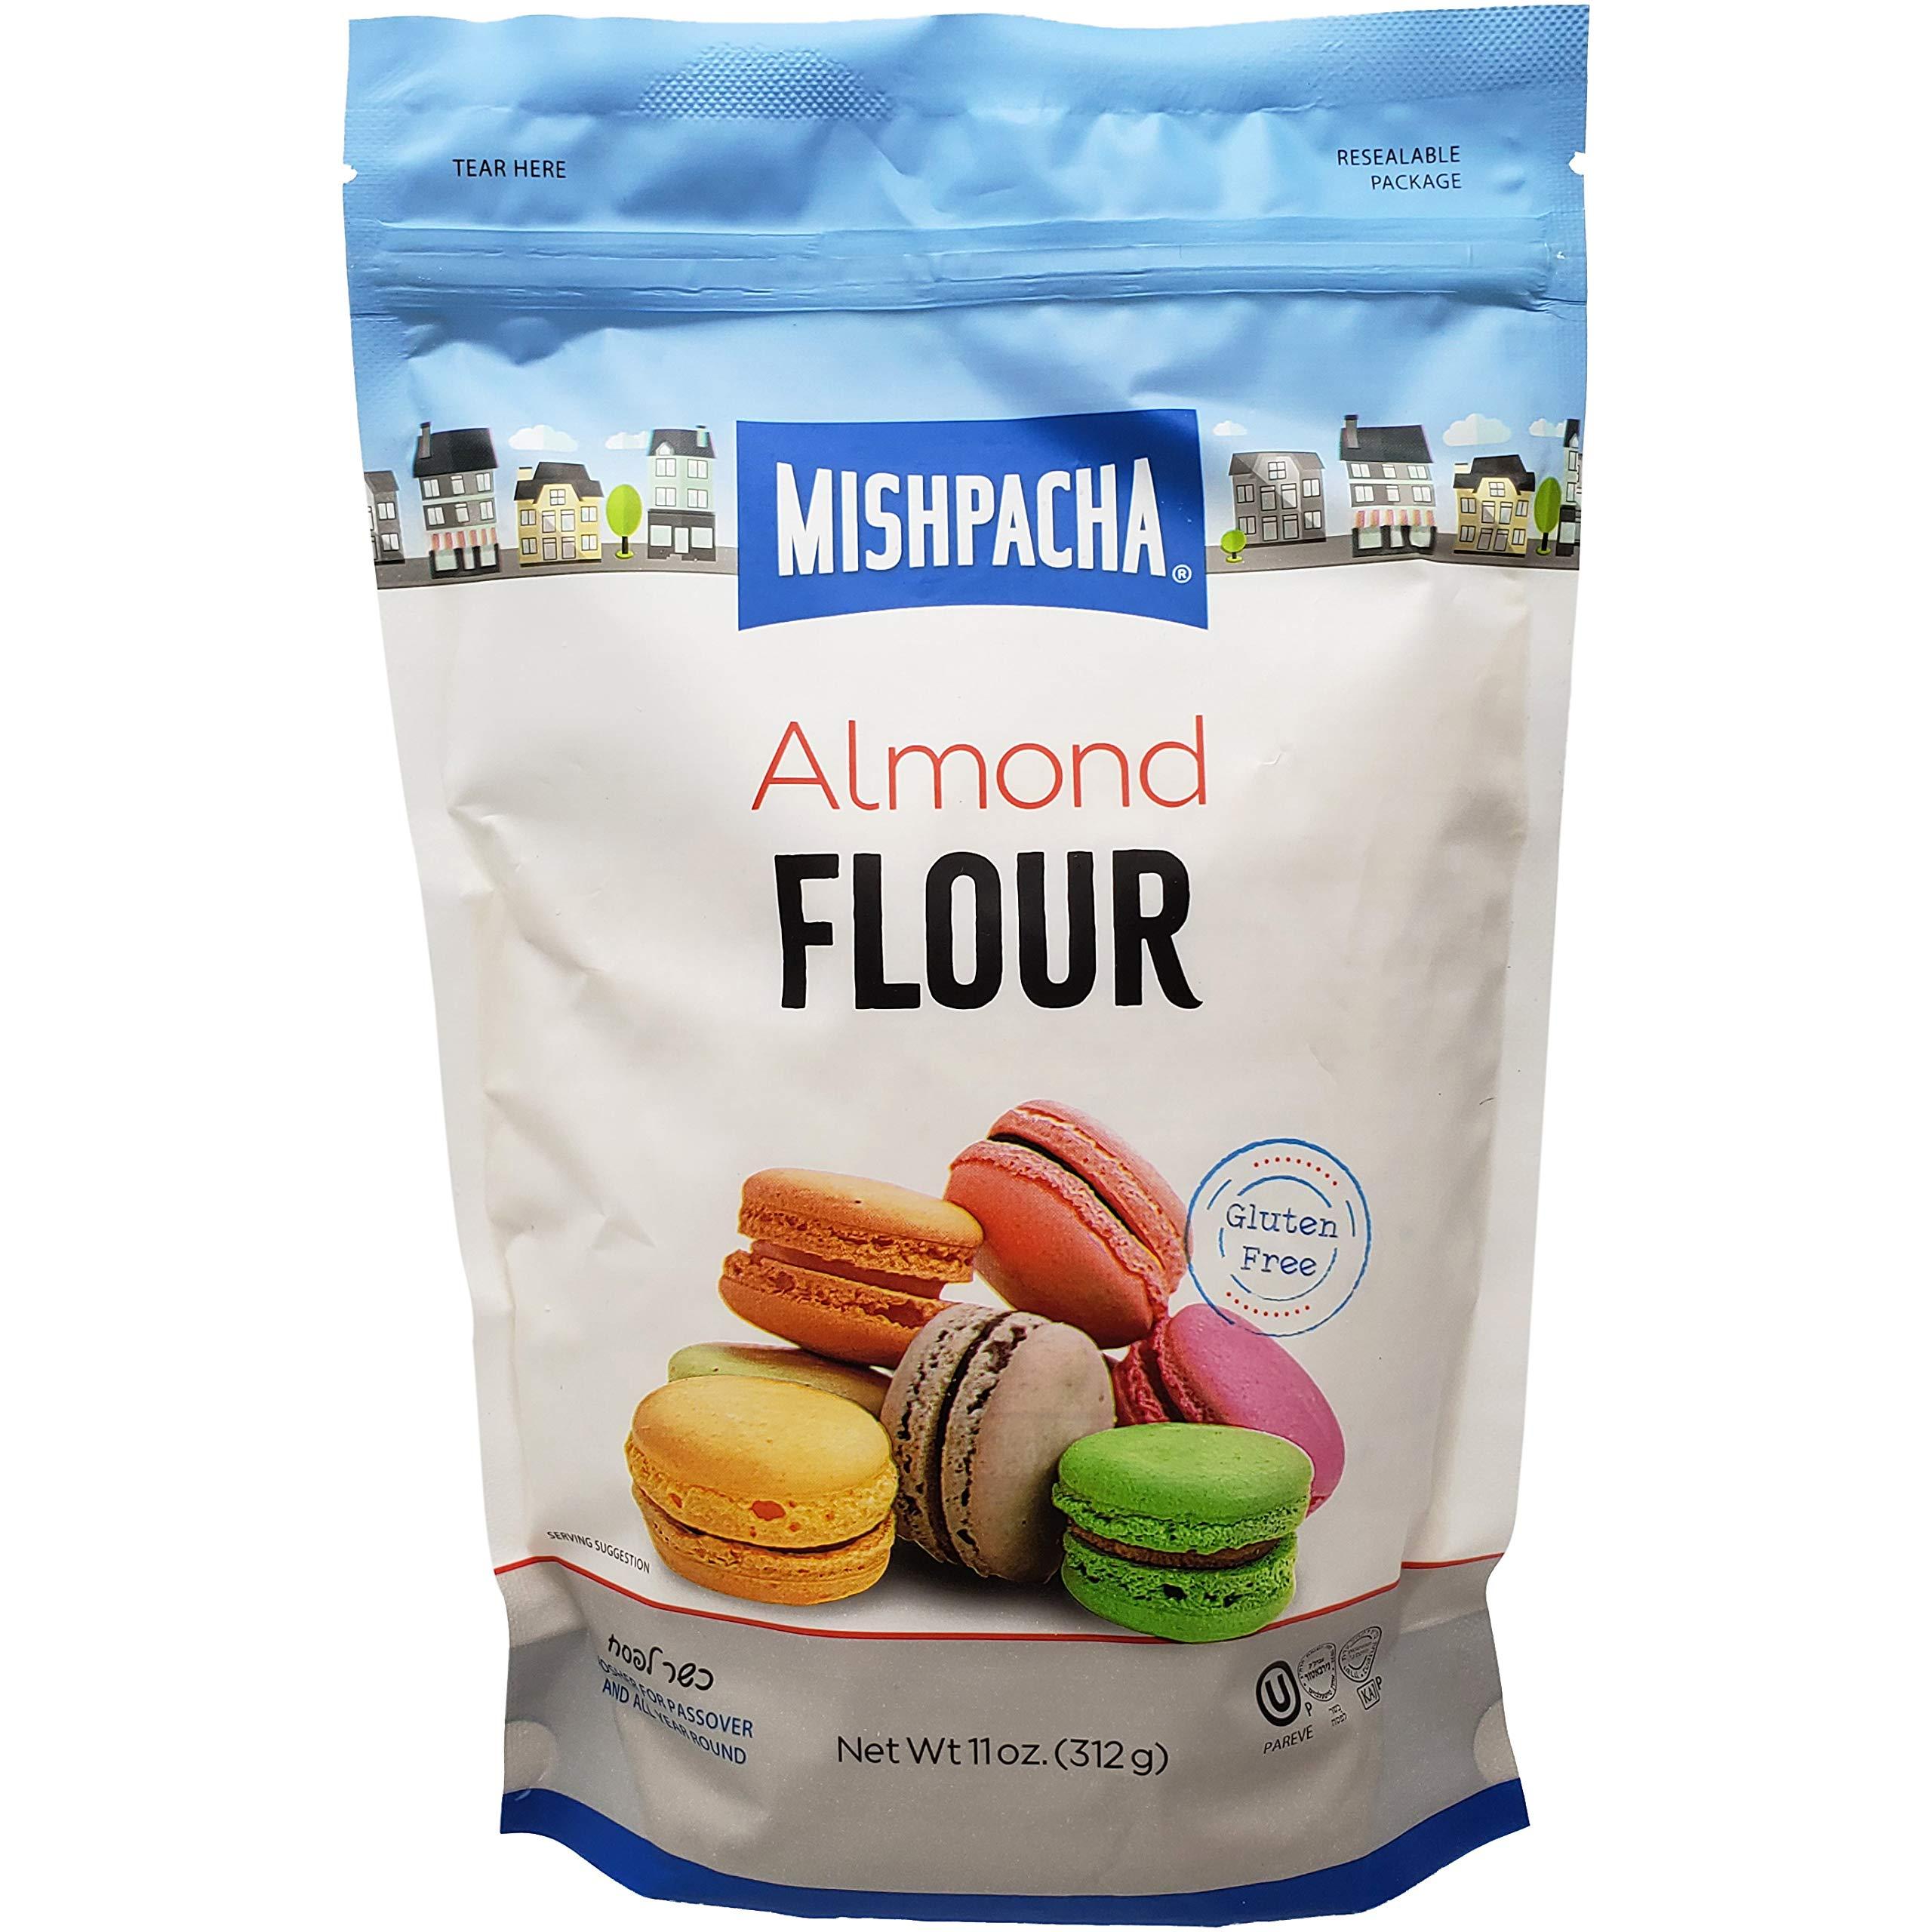 Mishpacha Almond Flour Bag, Kosher For Passover, Gluten-Free, 11 Ounce Bag (Single)